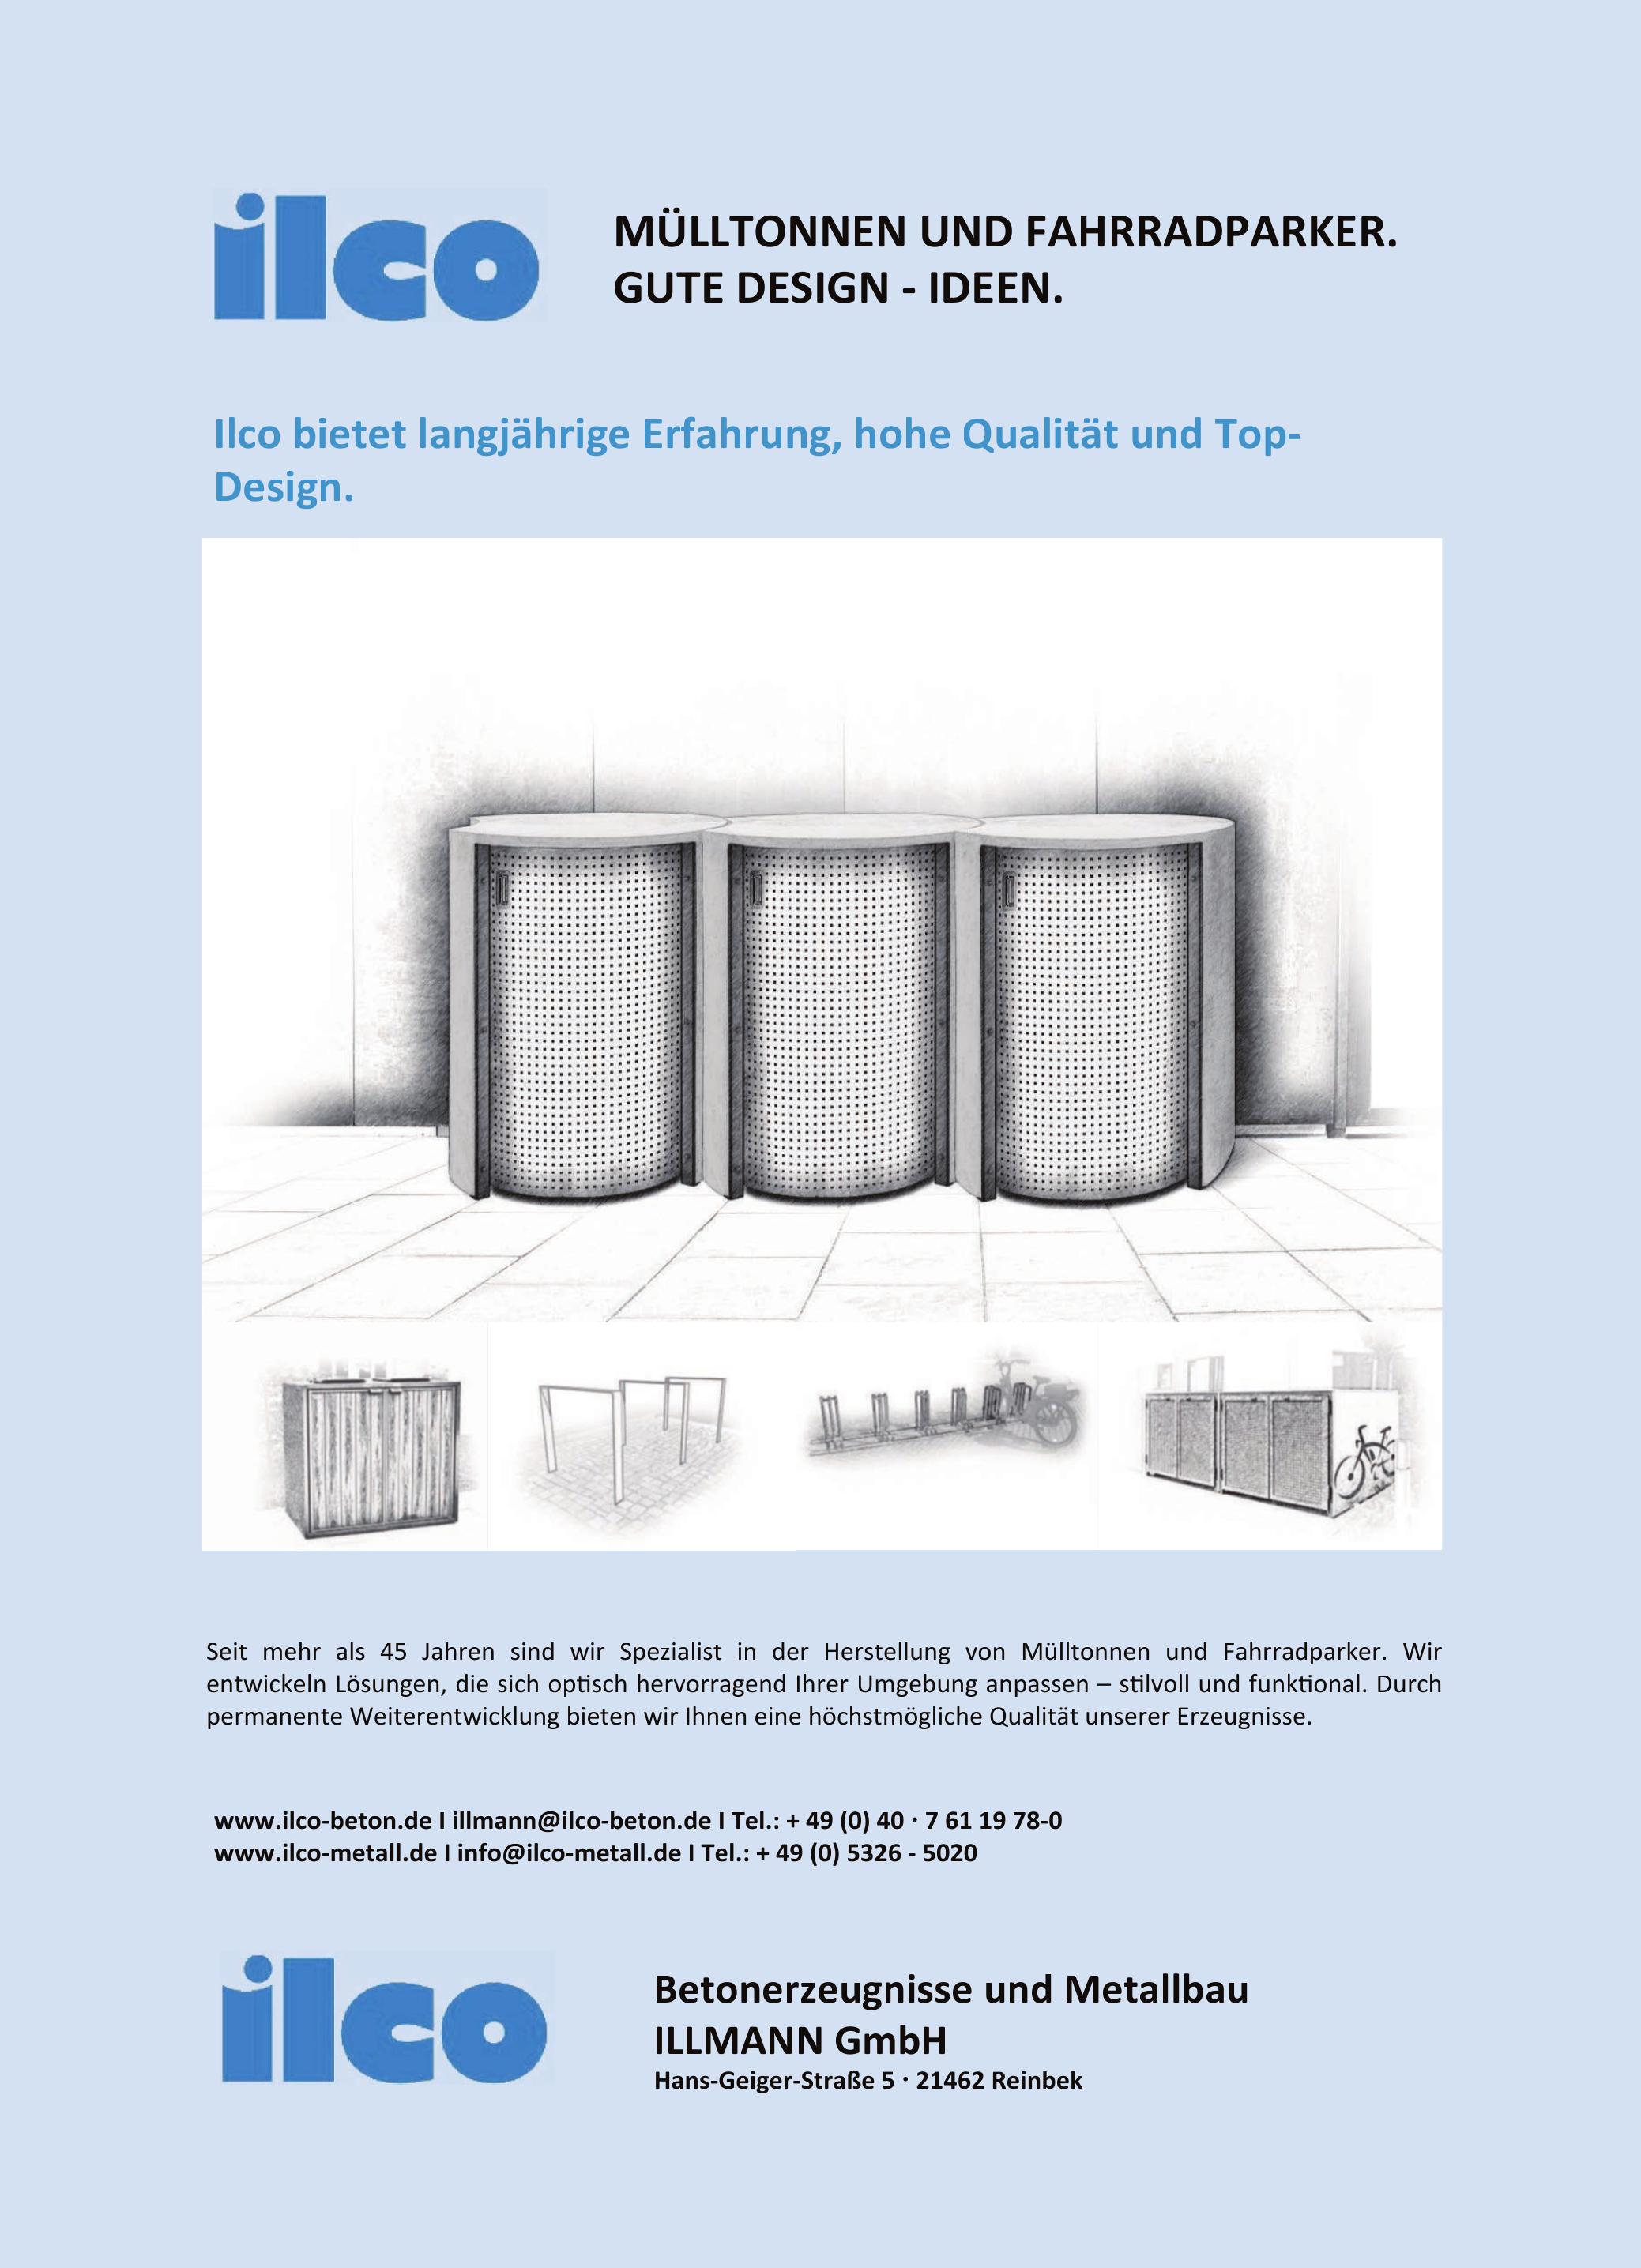 ilco Metallbau & Betonerzeugnisse Illmann GmbH